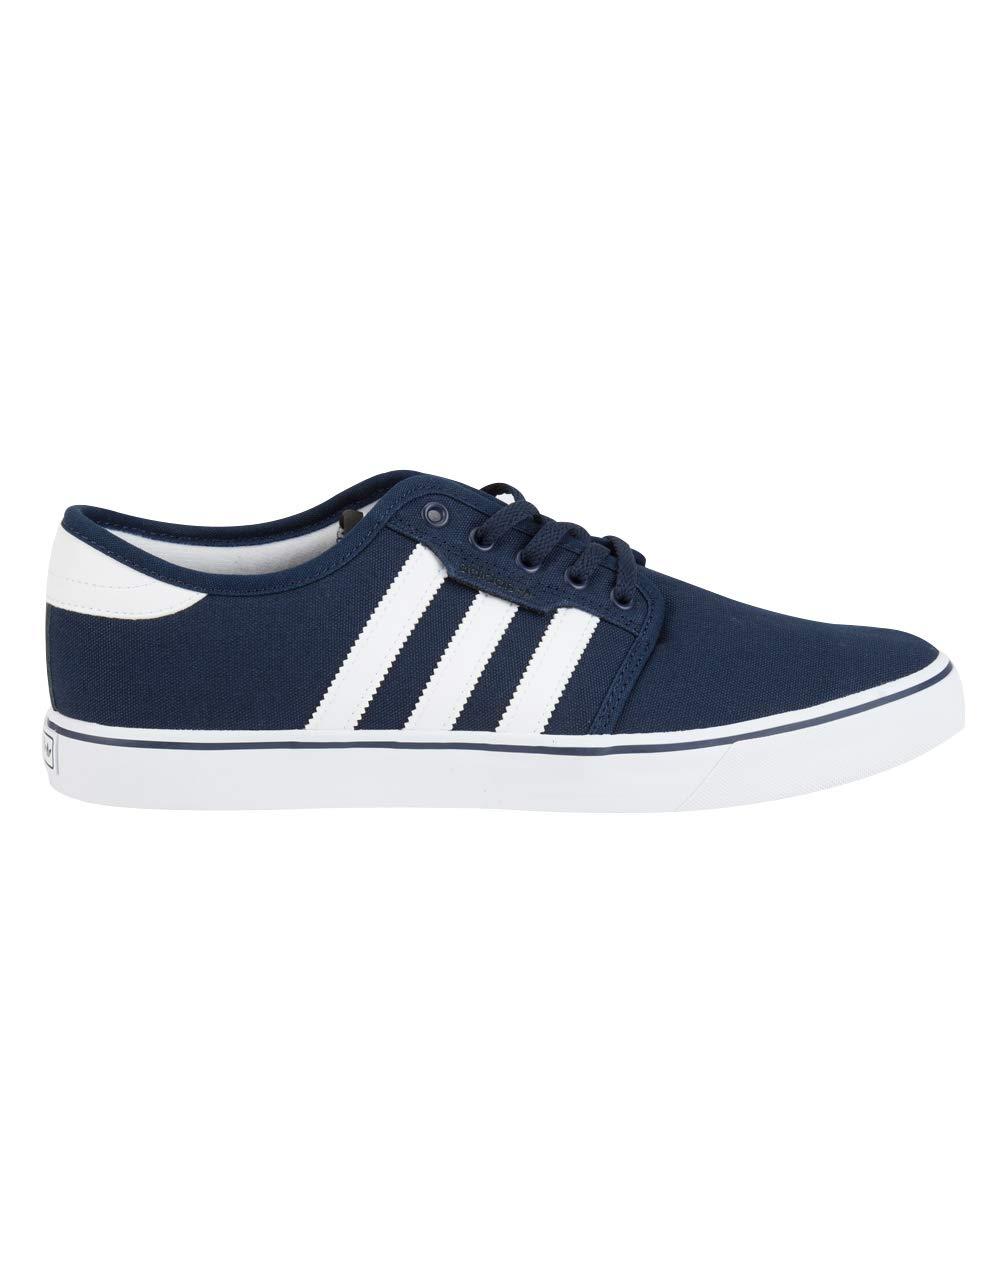 adidas Originals Men's Seeley Running Shoe, Collegiate Navy/White/Blue, 6 M US by adidas Originals